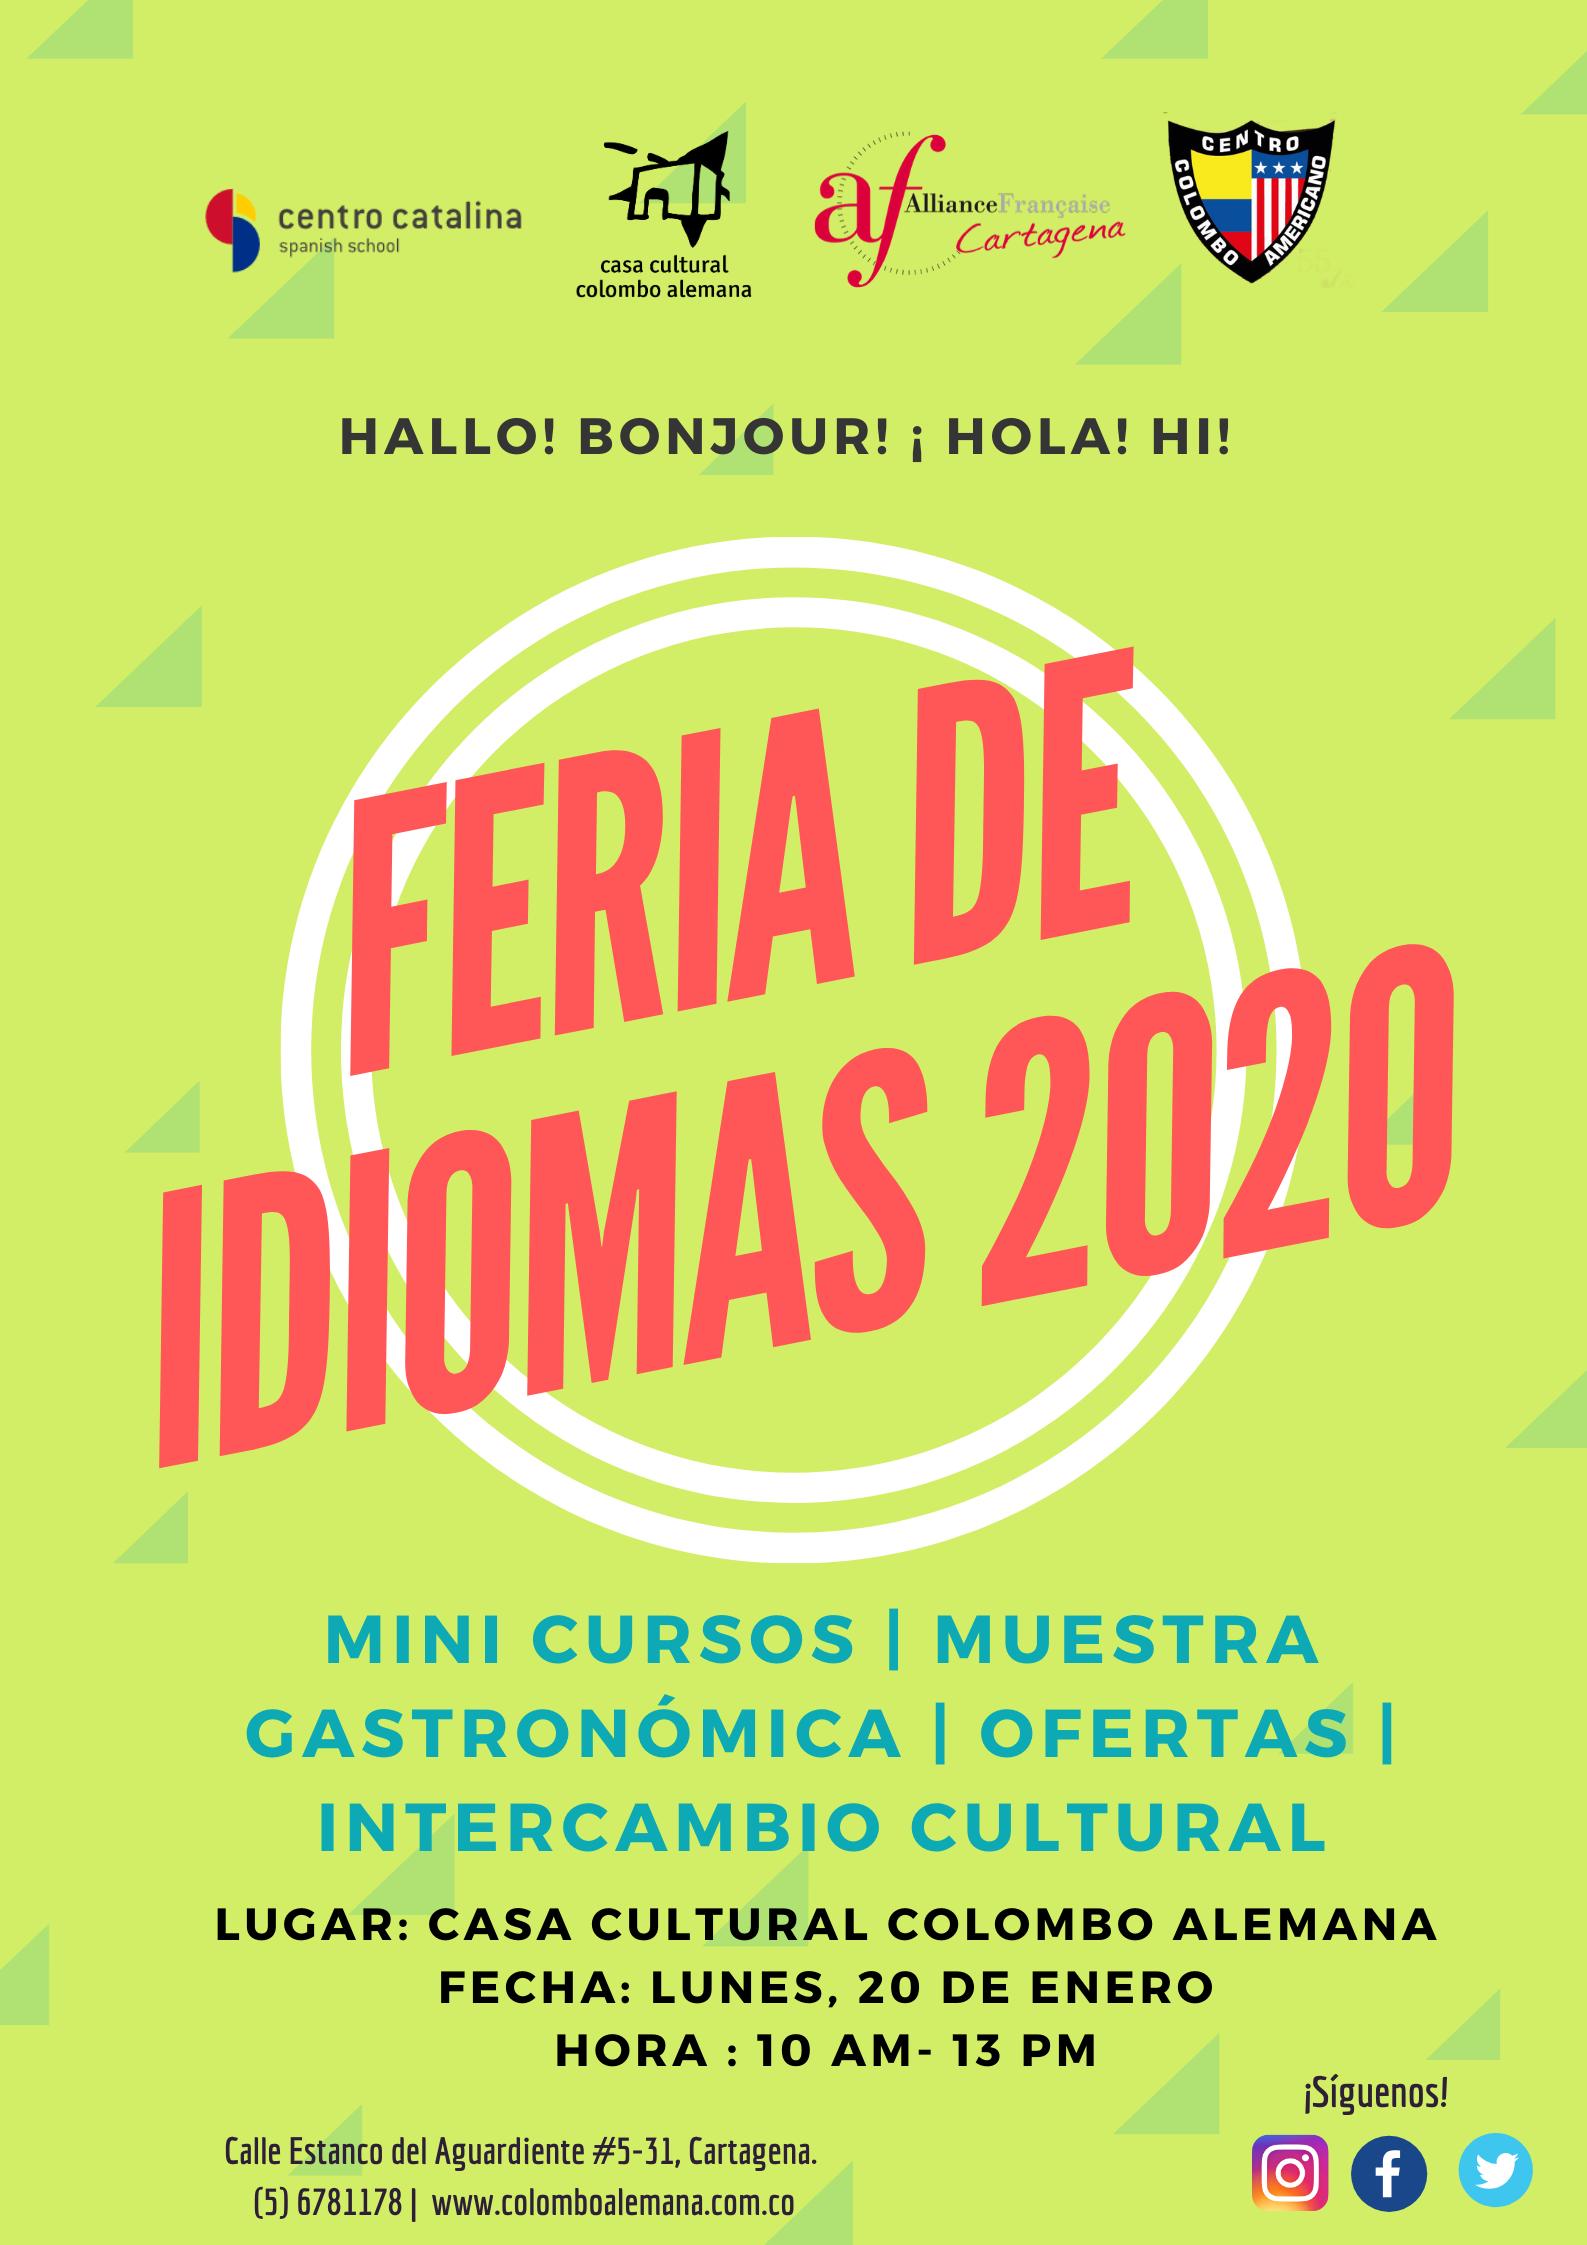 Feria de idiomas 2020